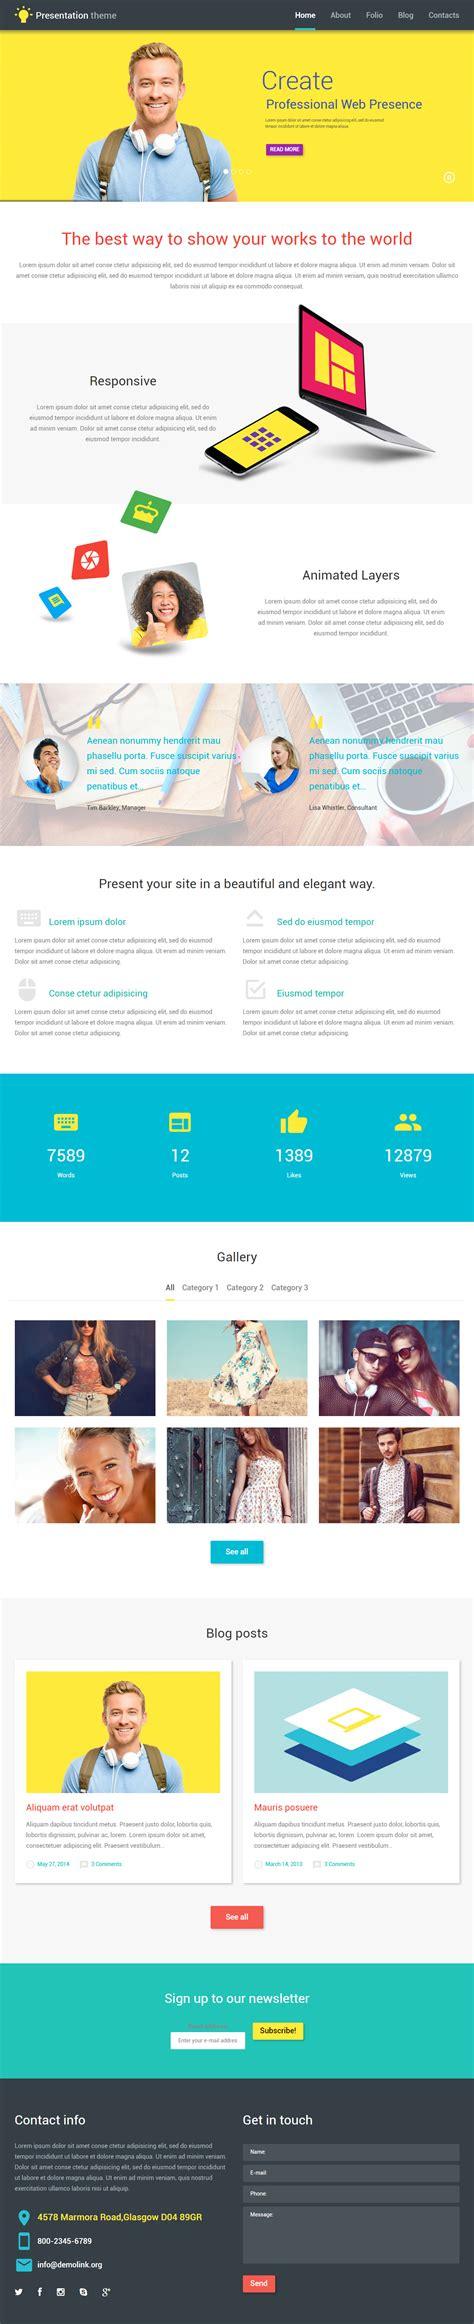 wordpress themes presentation best wordpress web design theme 2016 responsive miracle